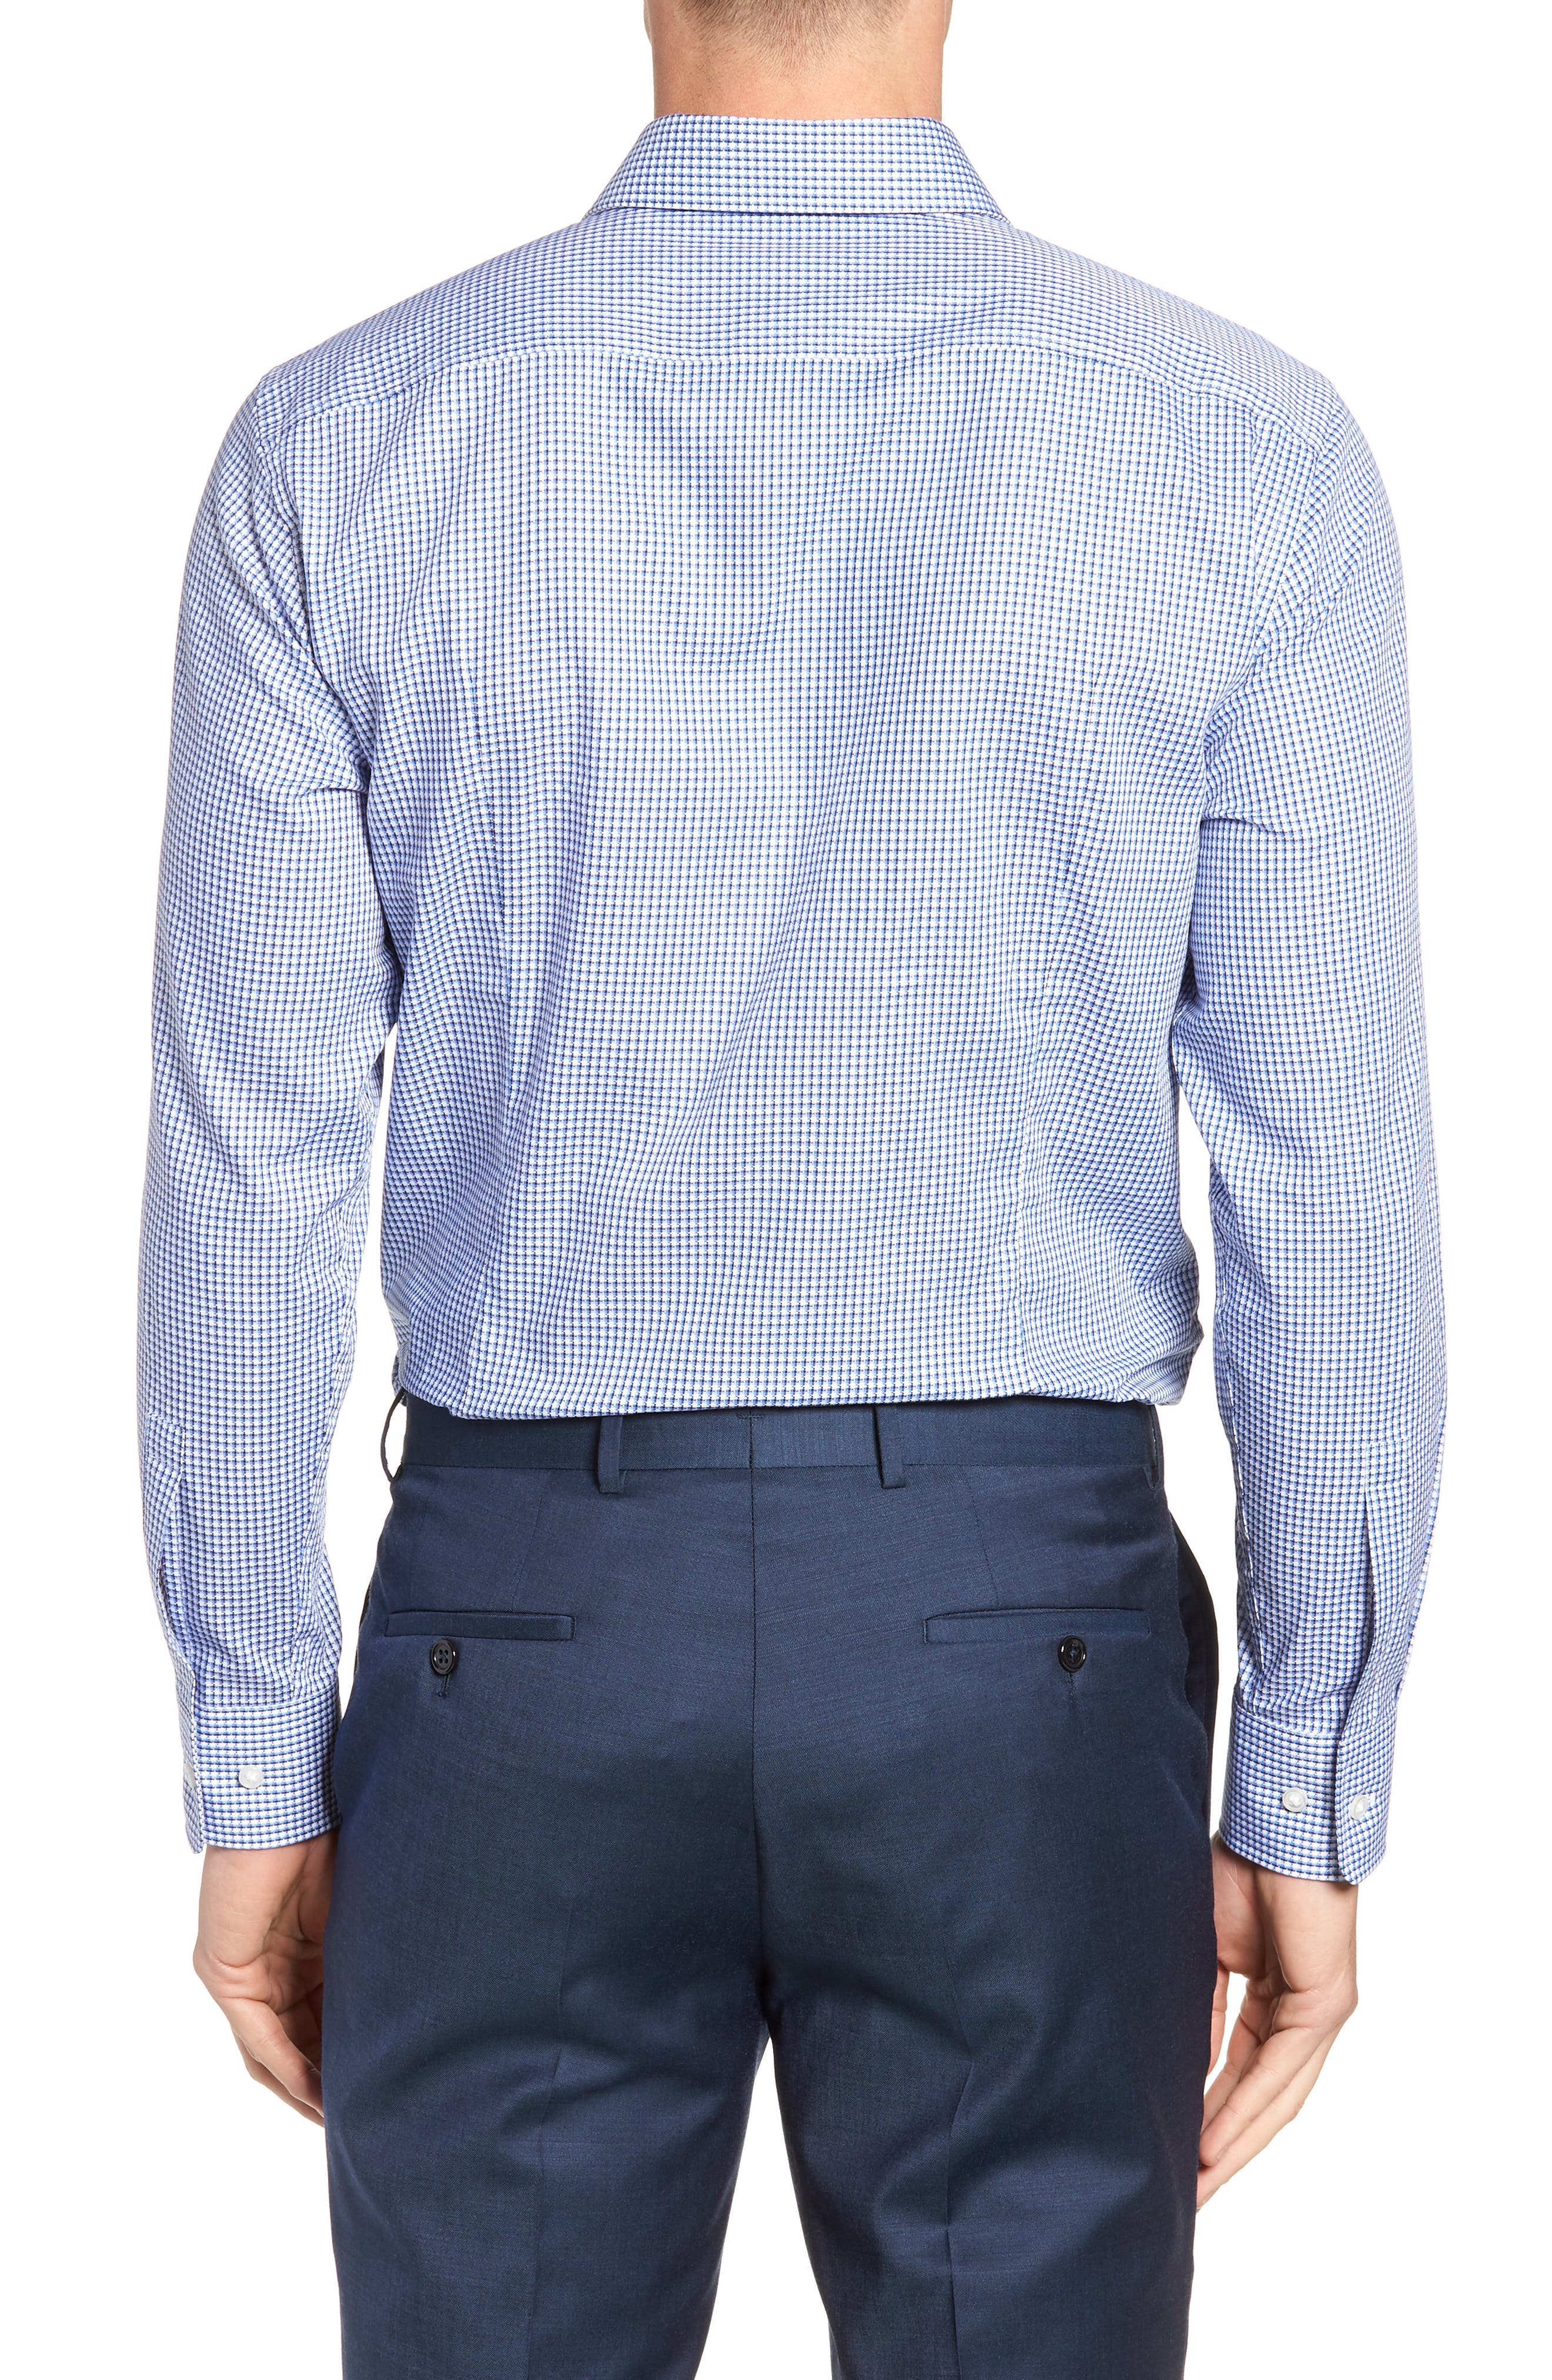 Mark Sharp Fit Check Dress Shirt,                             Alternate thumbnail 3, color,                             420